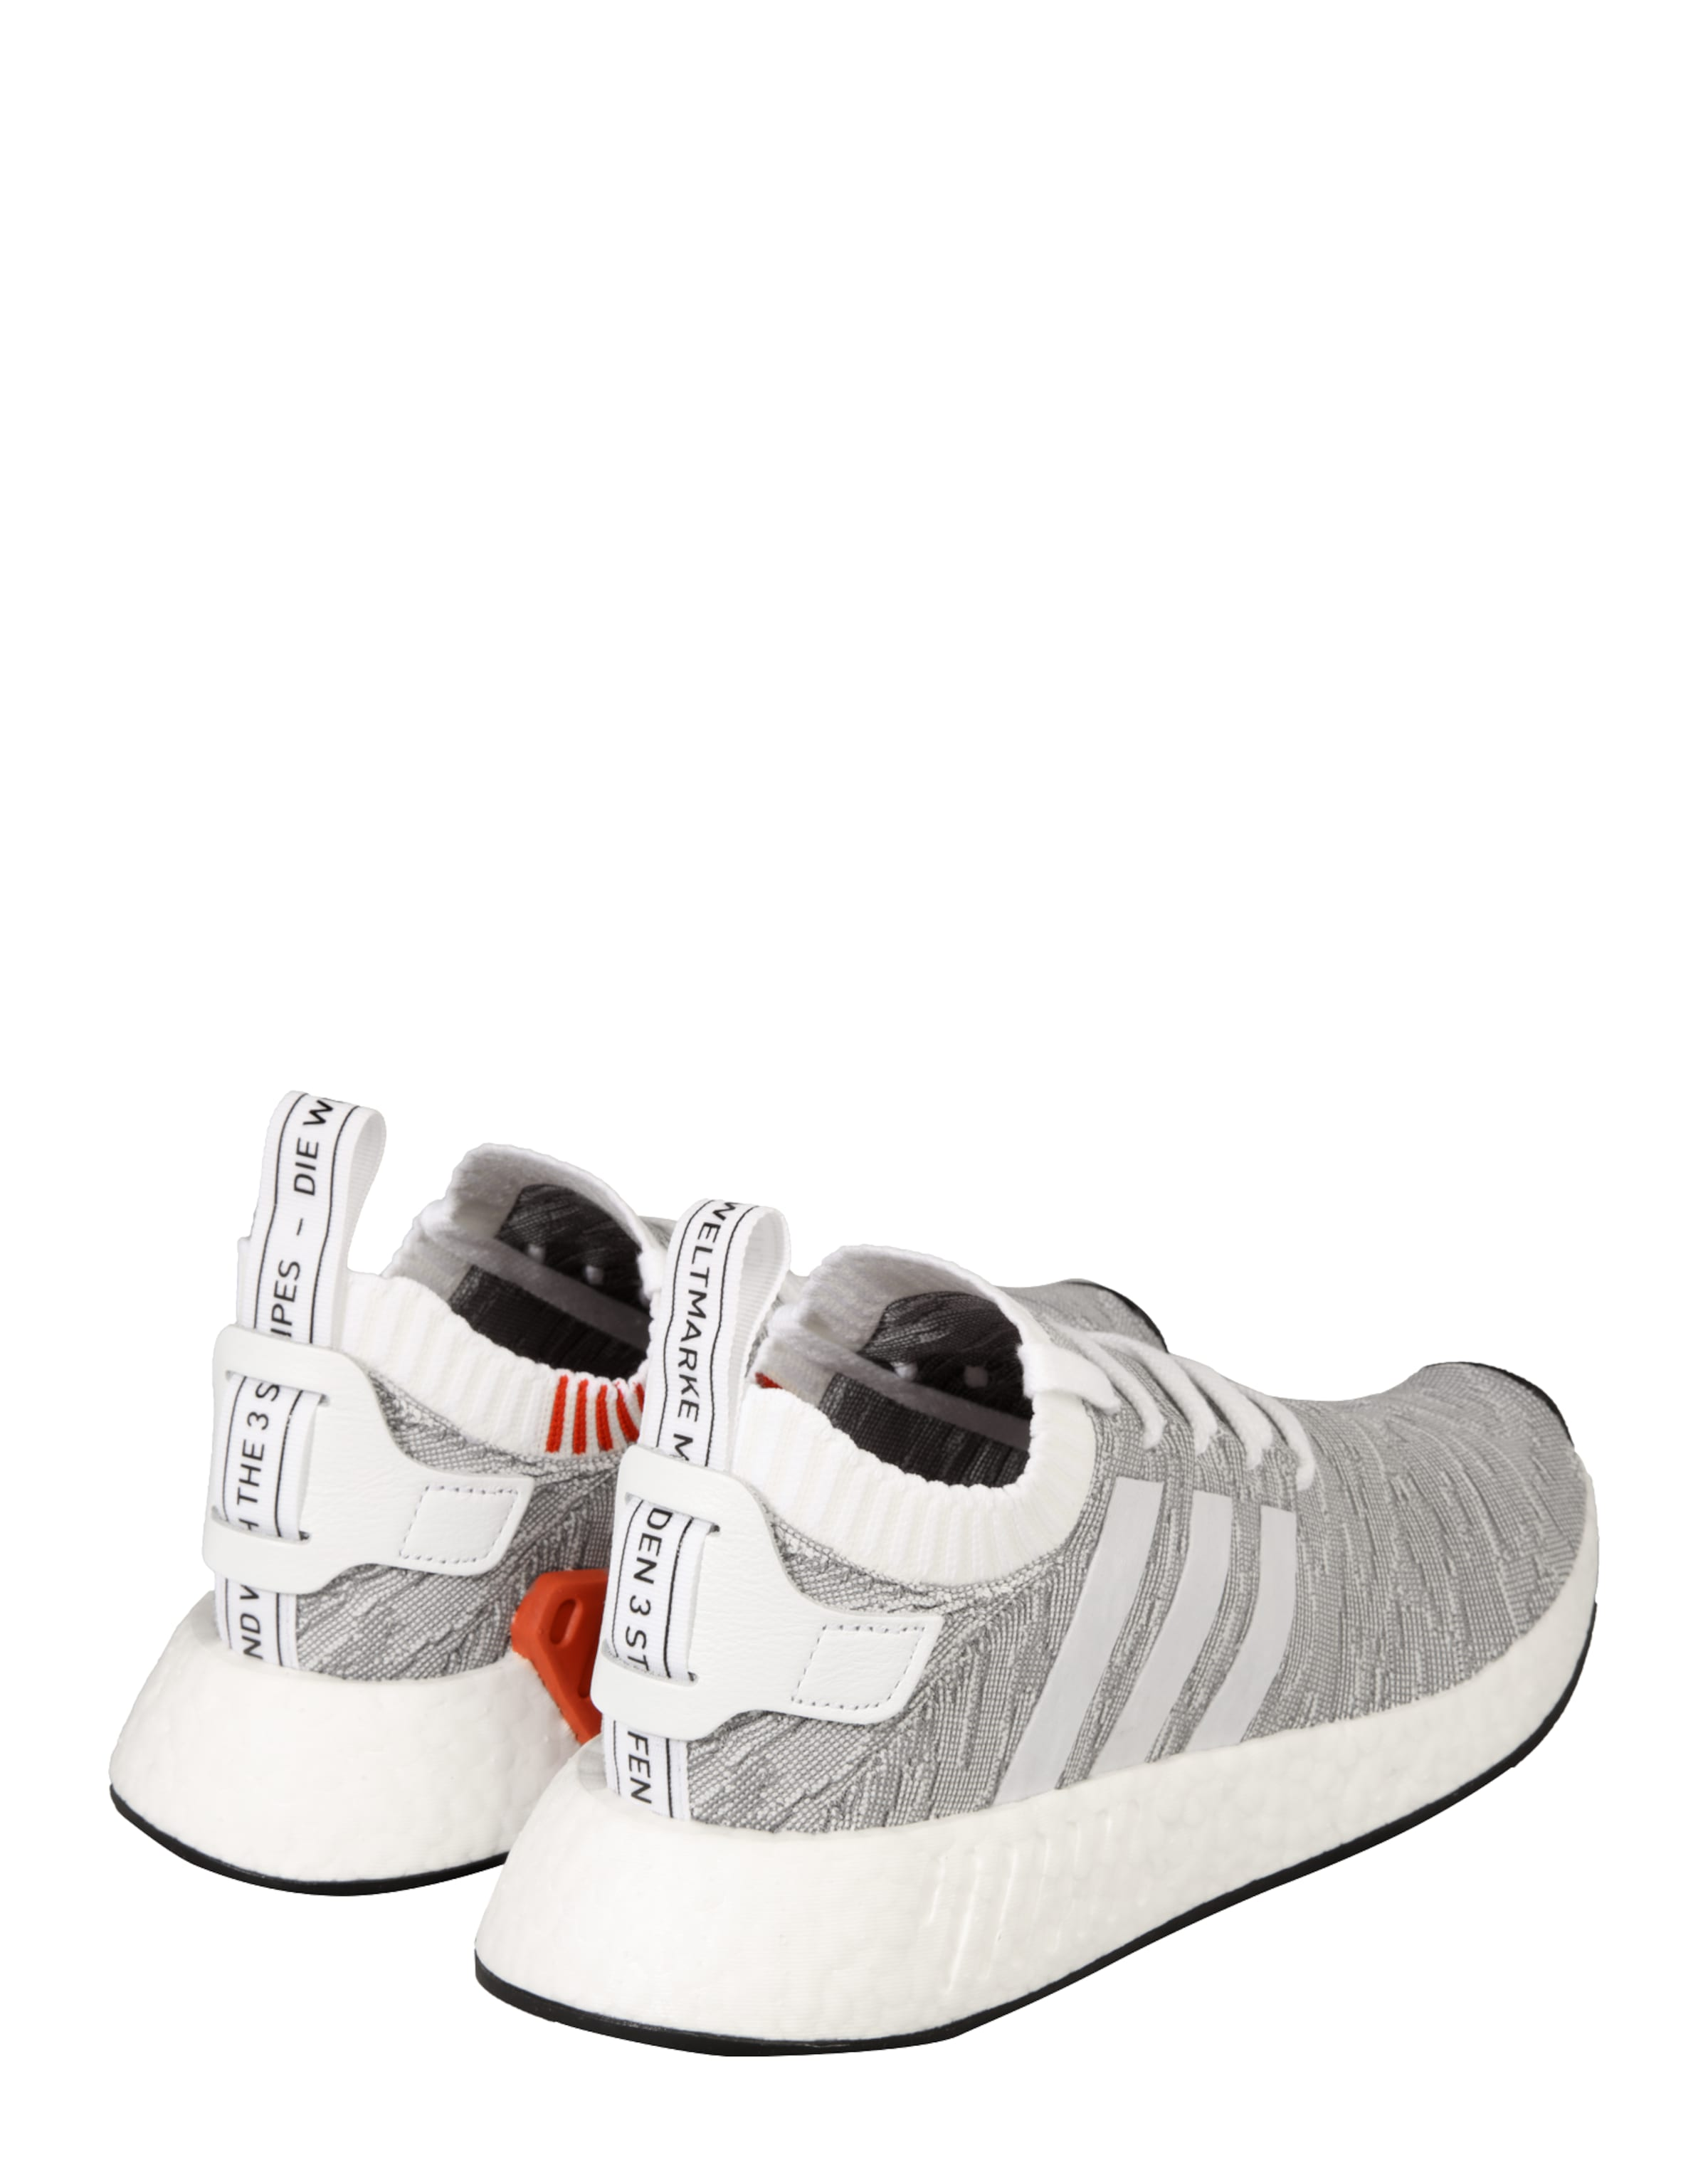 Laag Originals Sneakers Lichtgrijs Adidas In Sinaasappel wFAqHU